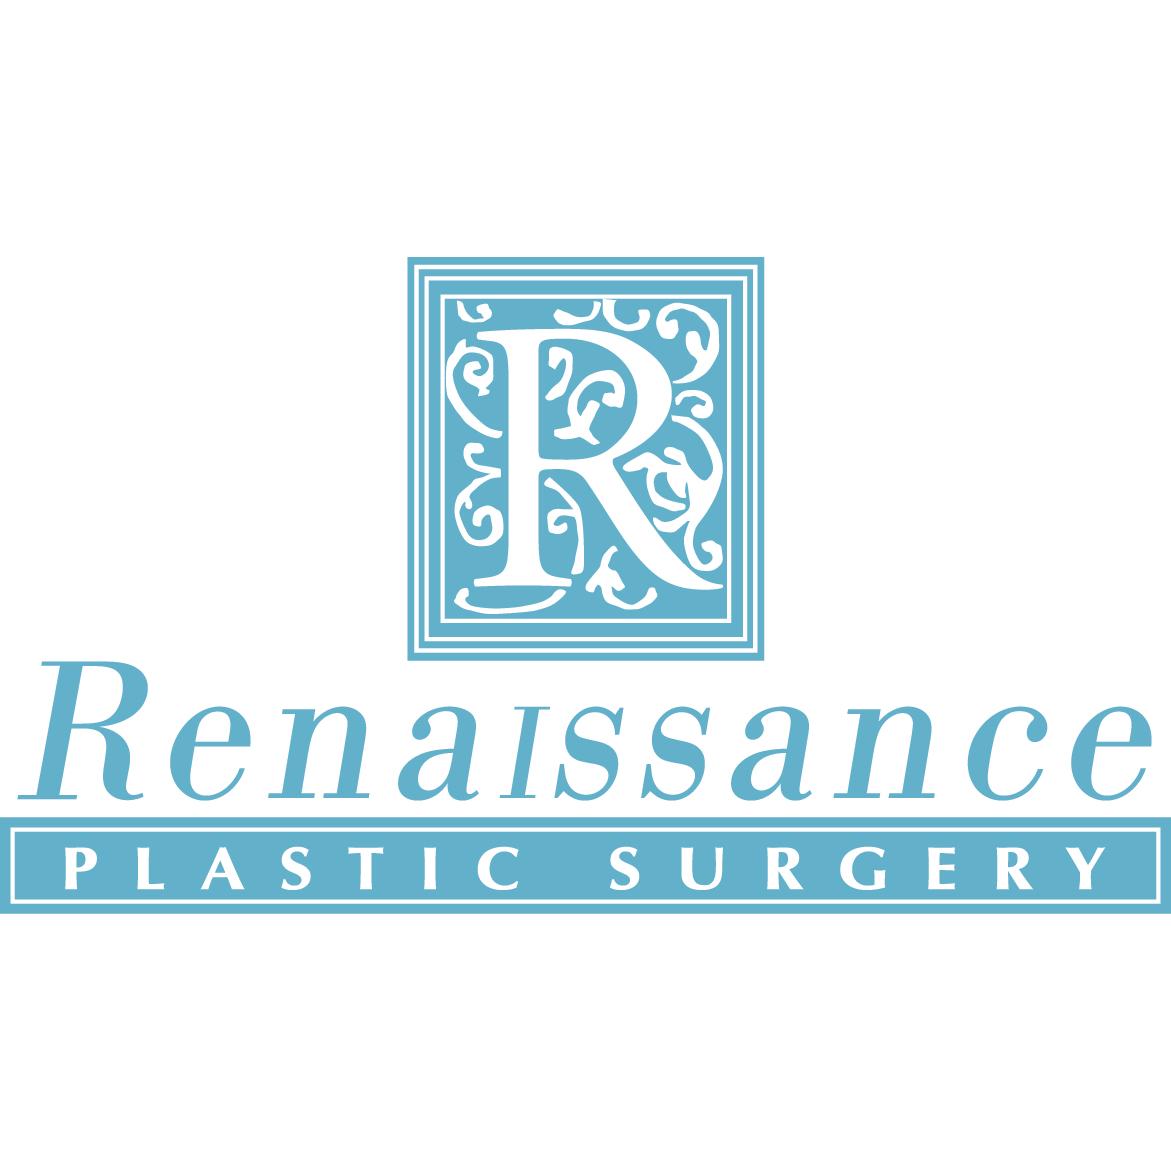 Renaissance Plastic Surgery: Joseph Fata, MD